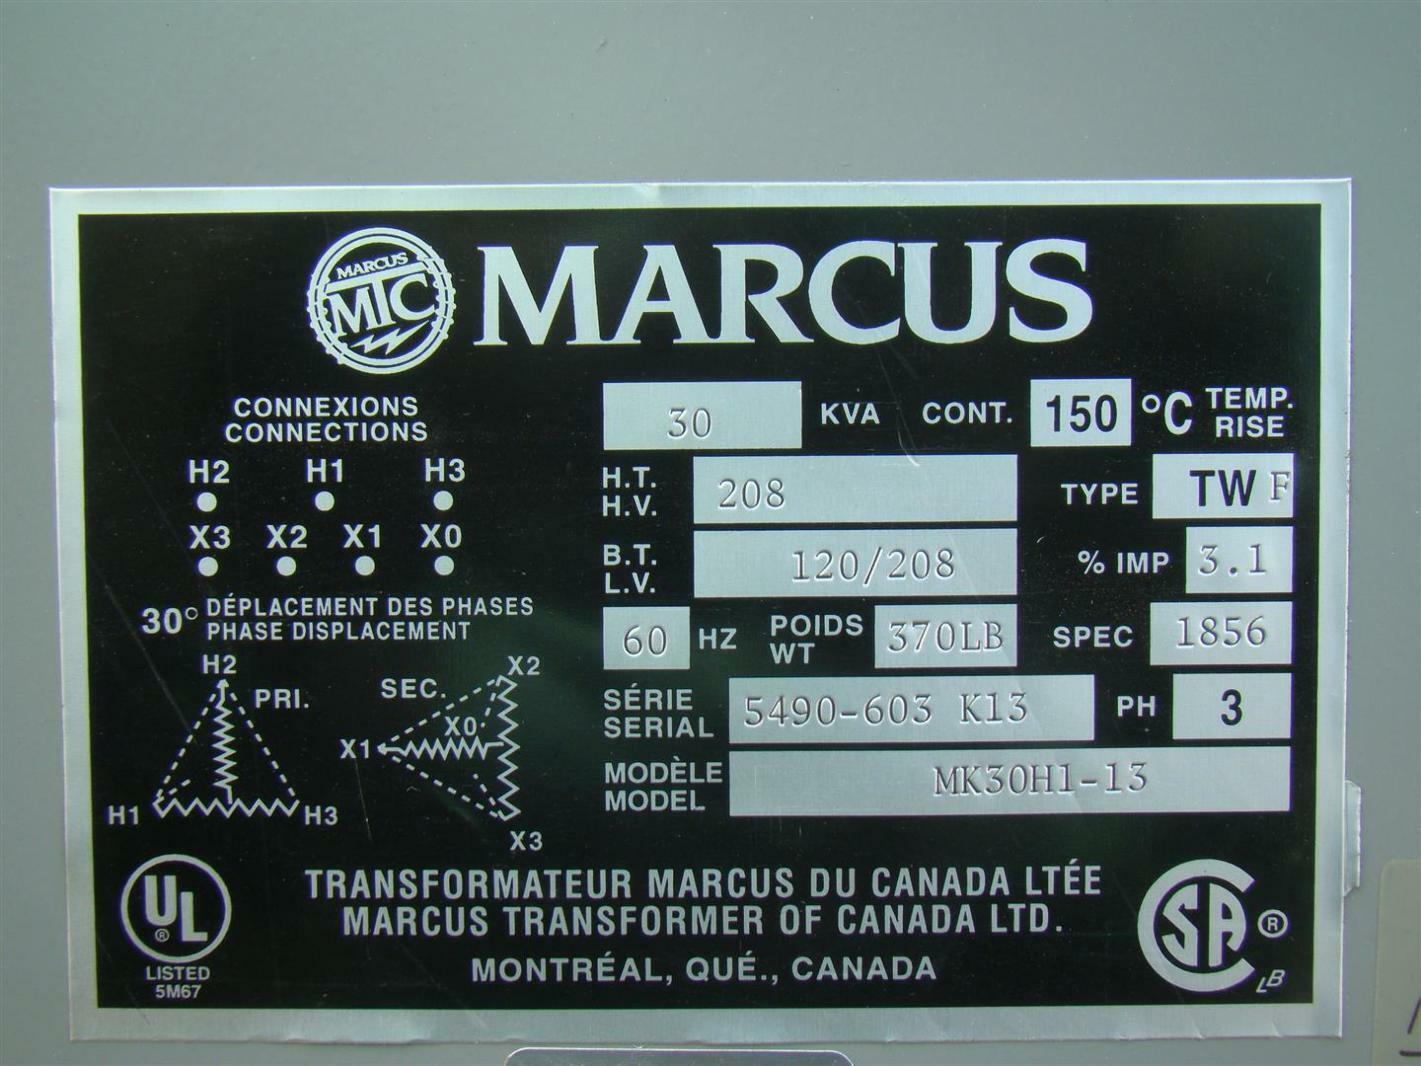 Marcus 3 Phase Transformer 208 x120/208 Volt 30 KVA MK30H1-13 ...